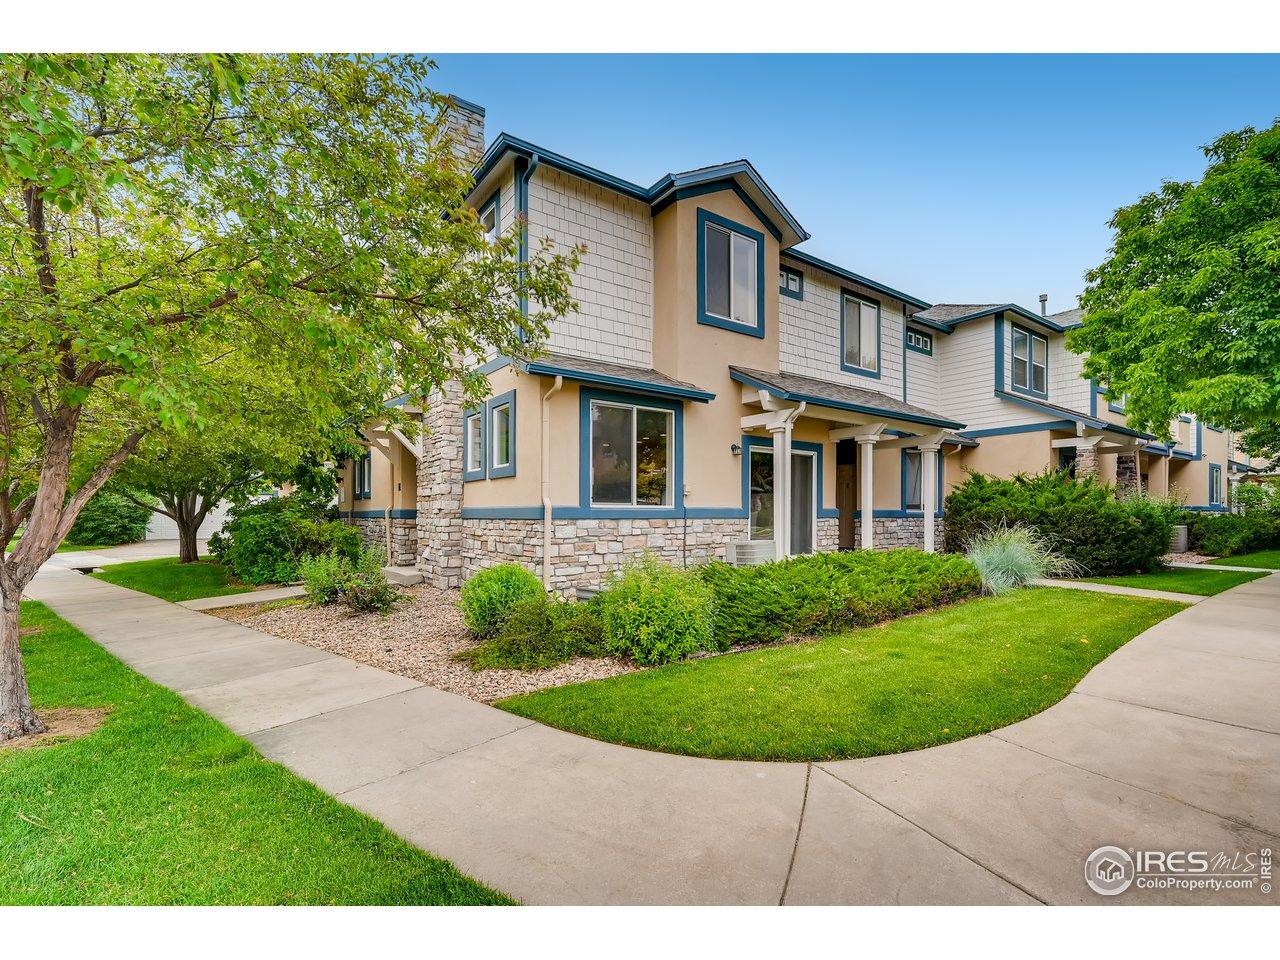 2426 Parkfront Dr M, Fort Collins CO 80525